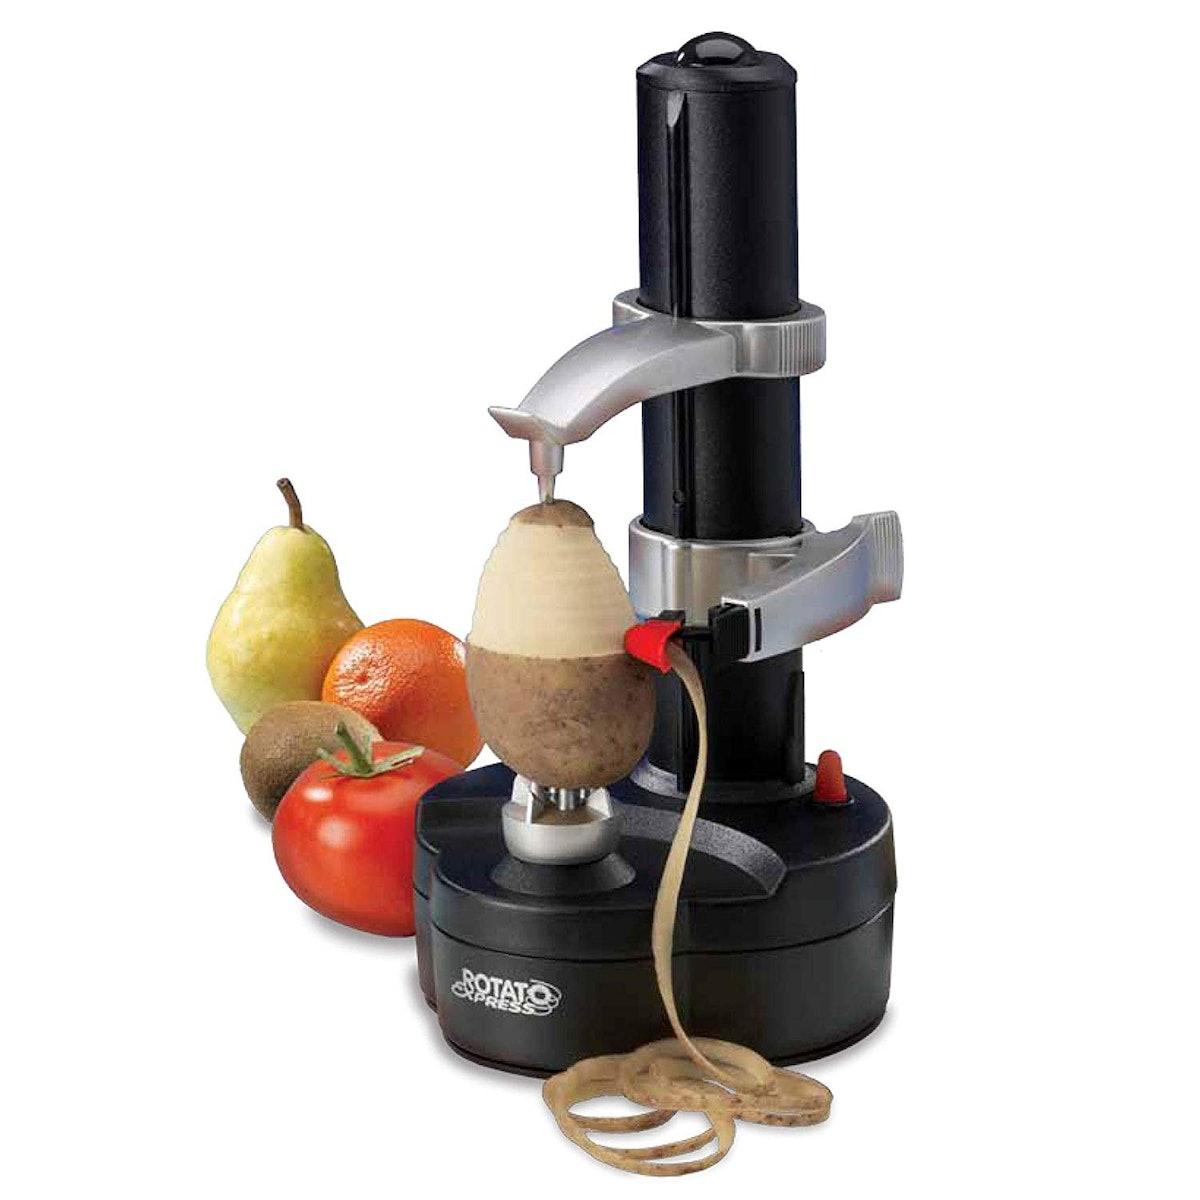 Starfrit Electric Potato Peeler